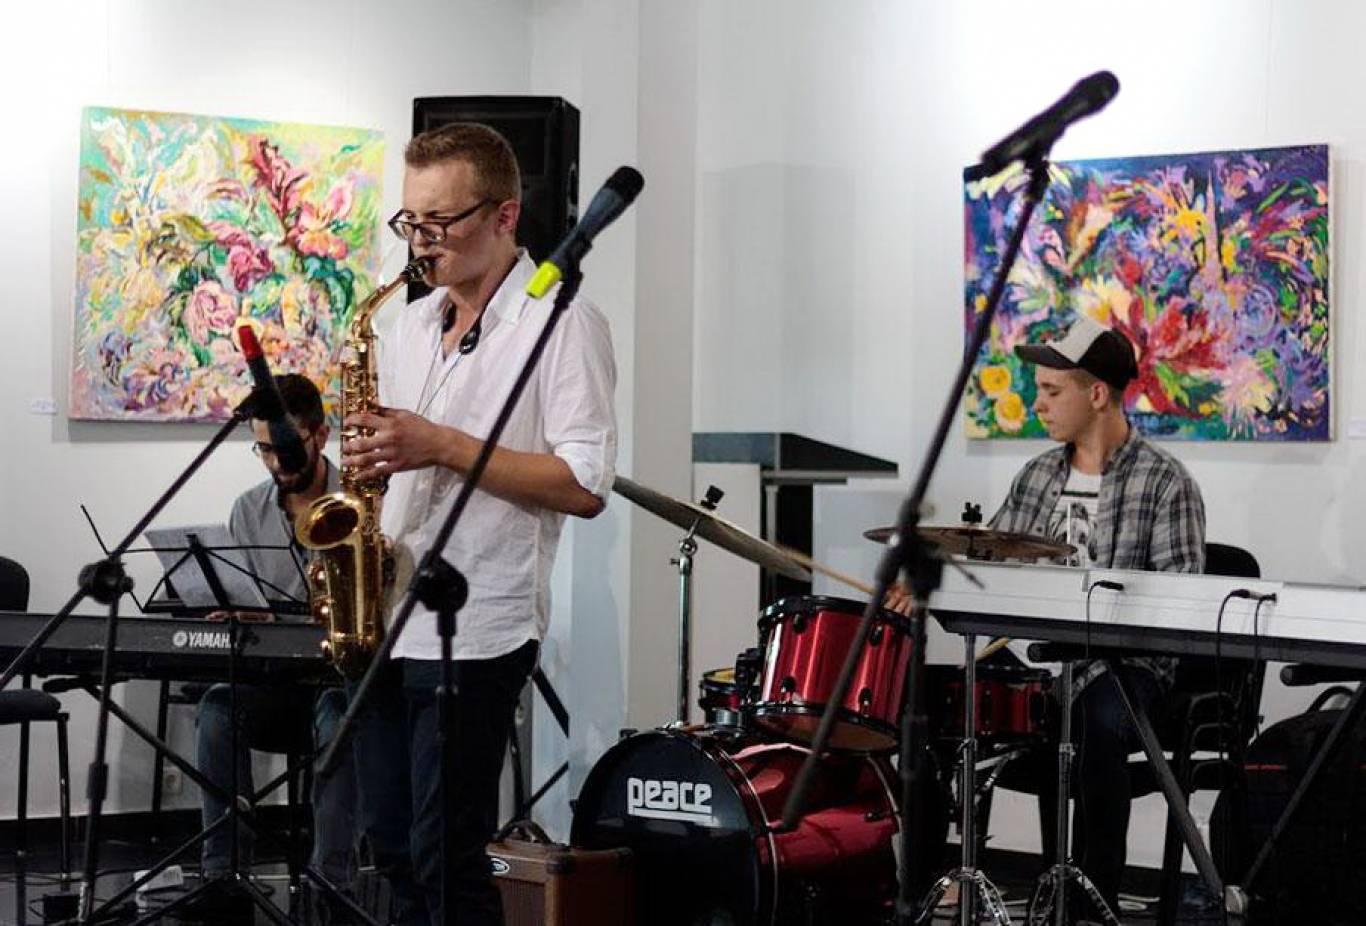 Всеукраїнський дитячий джазовий конкурс в рамках фестивалю VINNYTSIA JAZZFEST